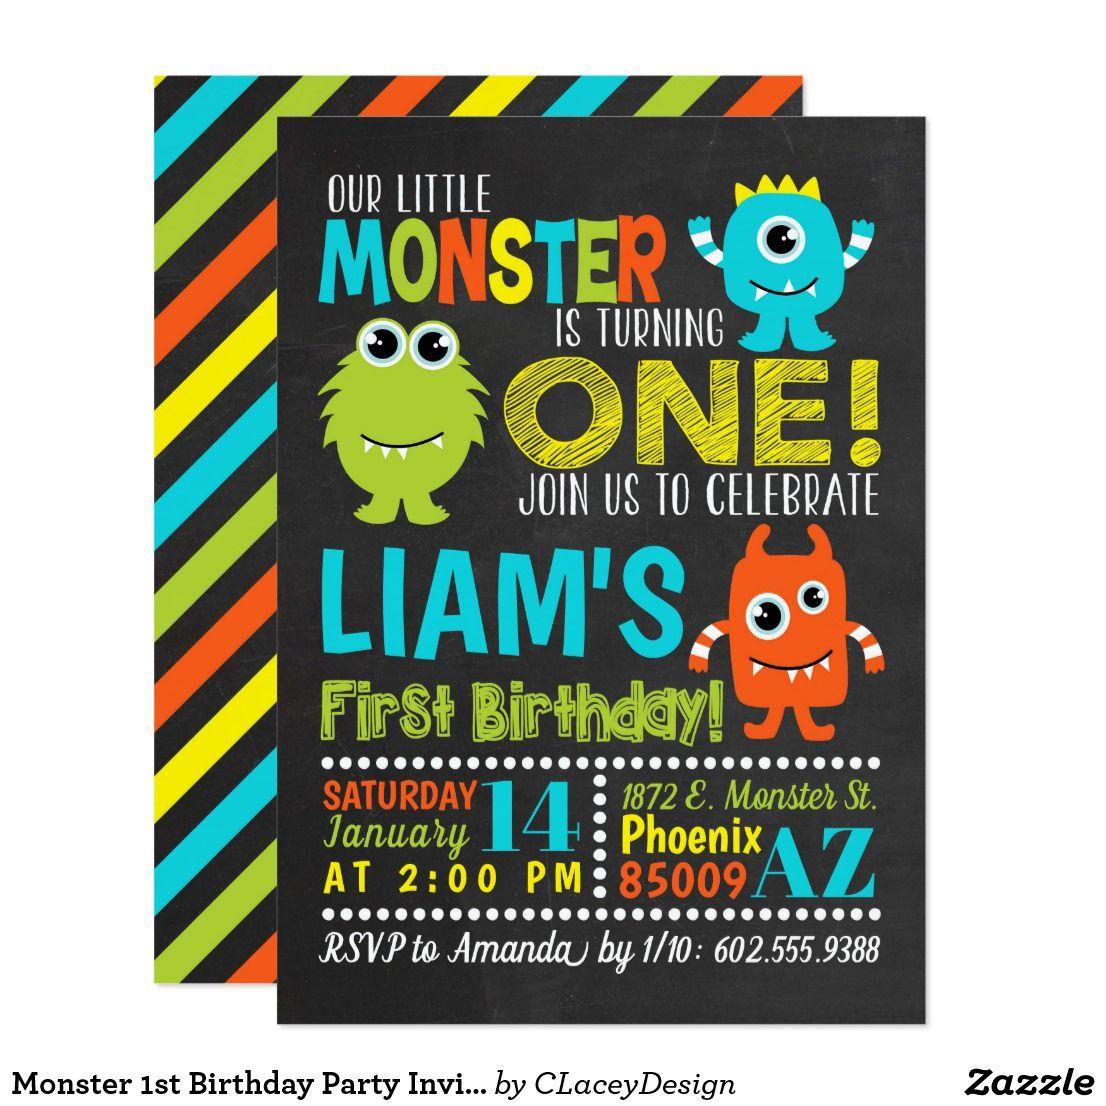 Monster 1st Birthday Party Invitation | Zazzle.com